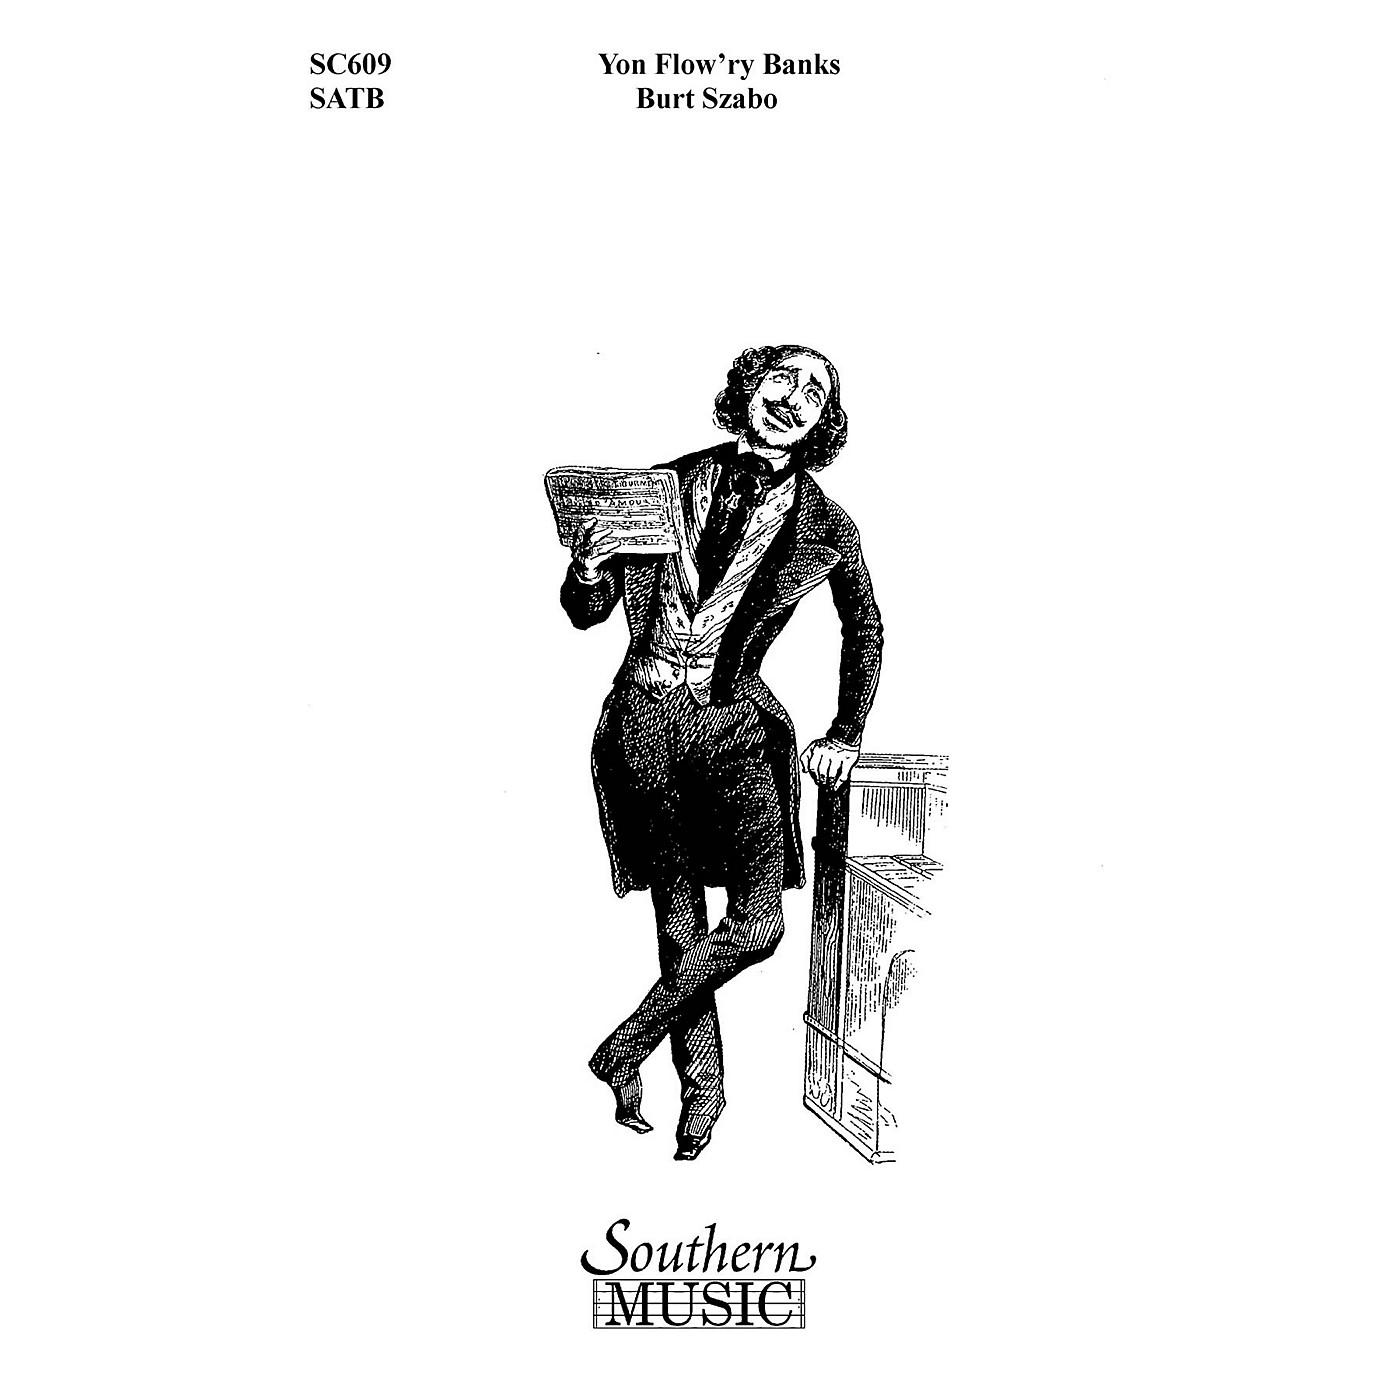 Hal Leonard Yon Flow'ry Banks (Choral Music/Octavo Secular Satb) SATB Composed by Szabo, Burt thumbnail